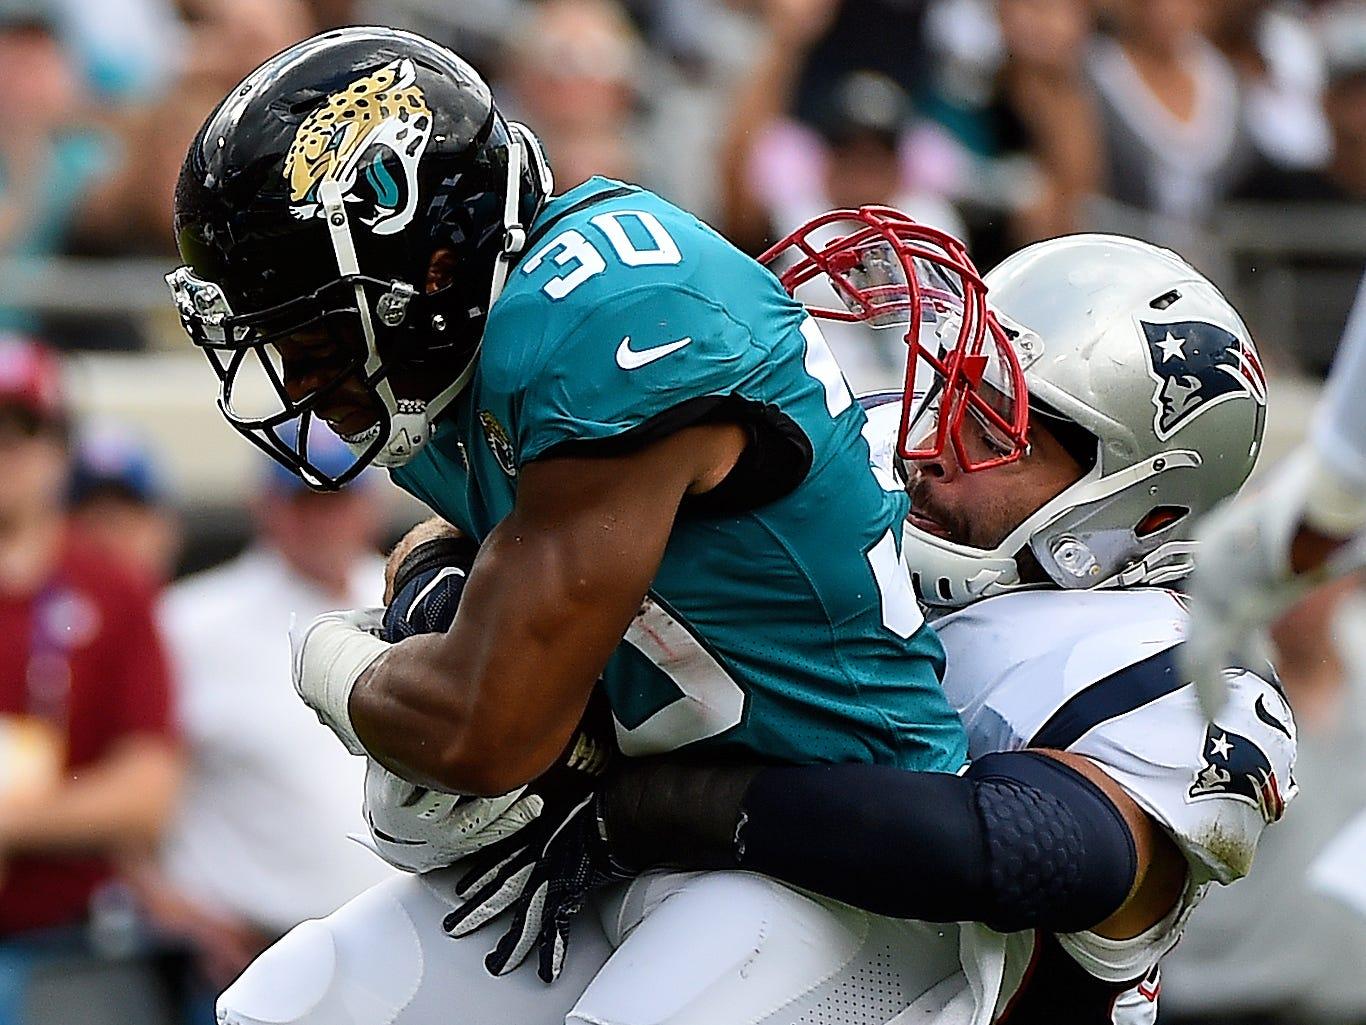 Week 2: New England Patriots linebacker Kyle Van Noy tackles Jacksonville Jaguars running back Corey Grant.